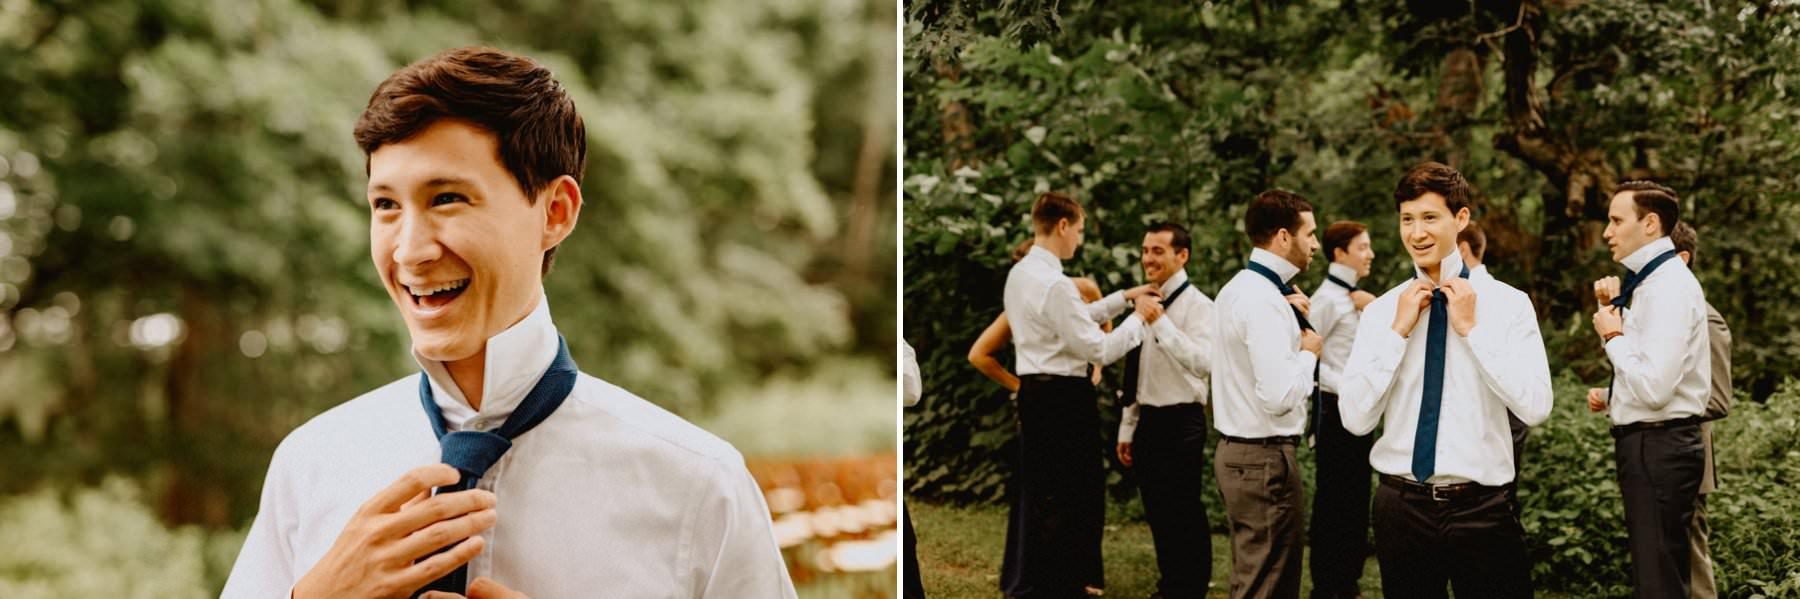 pennsylvania-private-estate-wedding-17.jpg